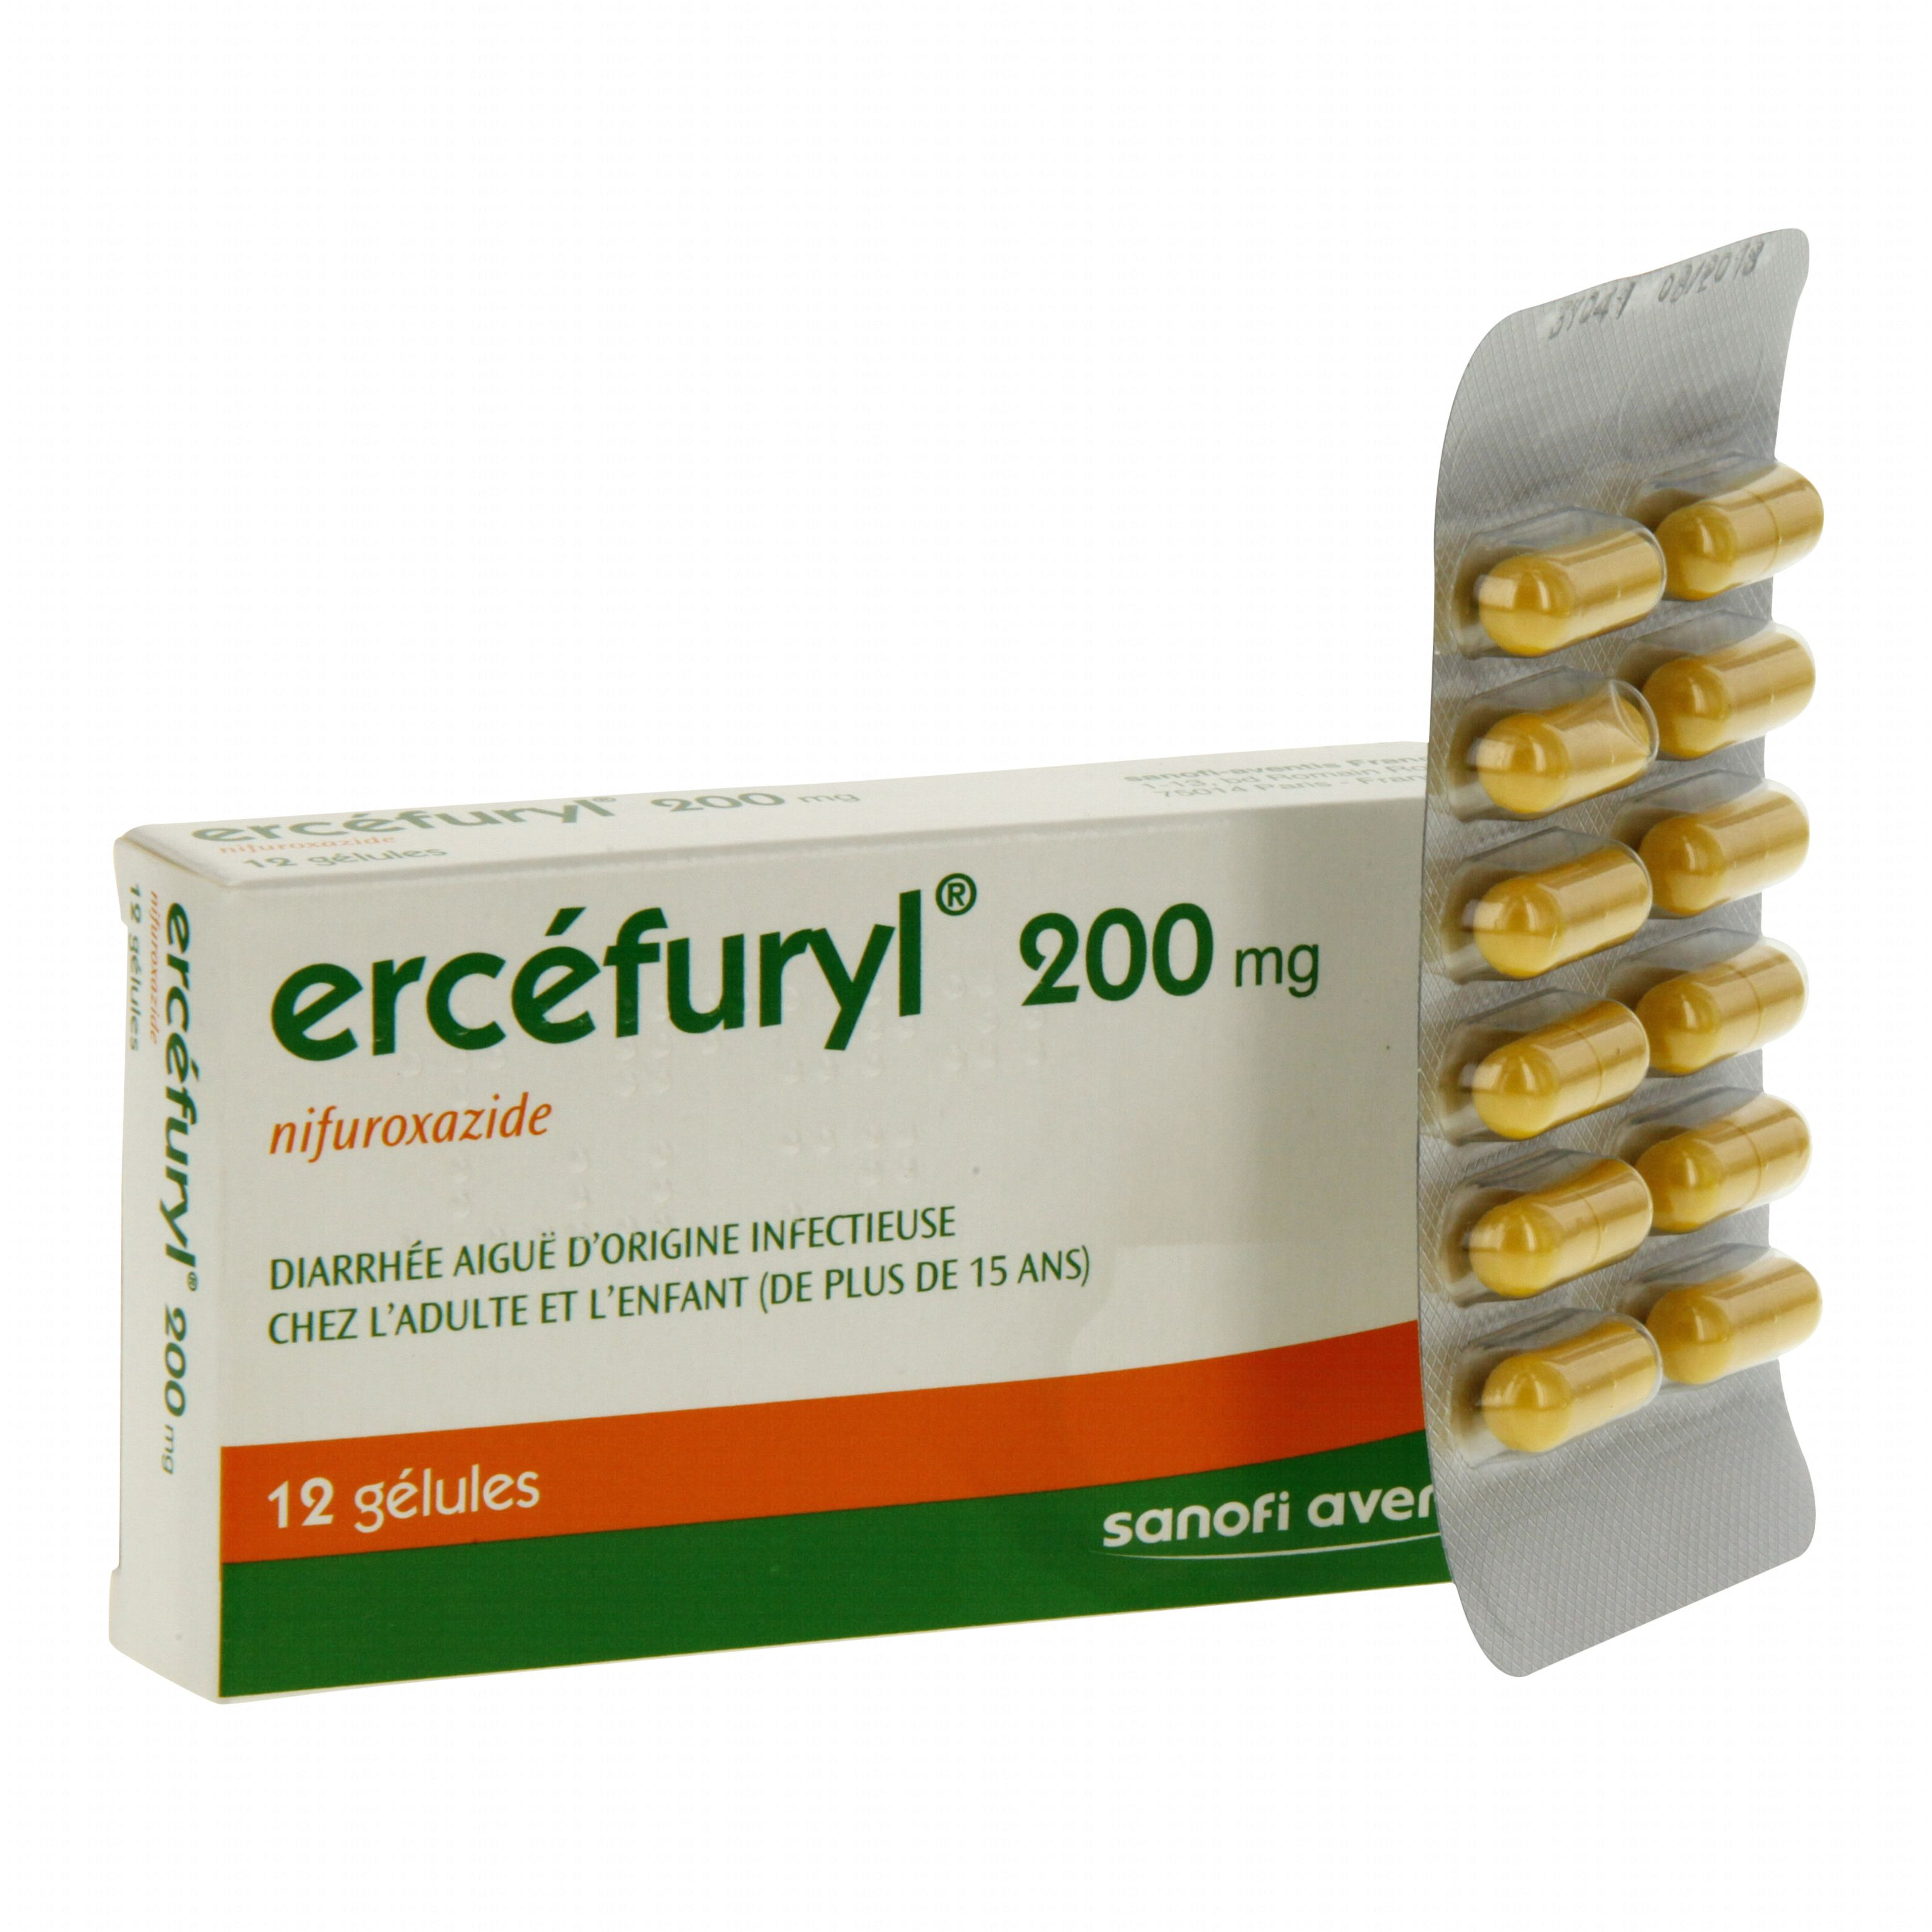 Ercefuryl 200 mg boîte de 12 gélules Sanofi Aventis